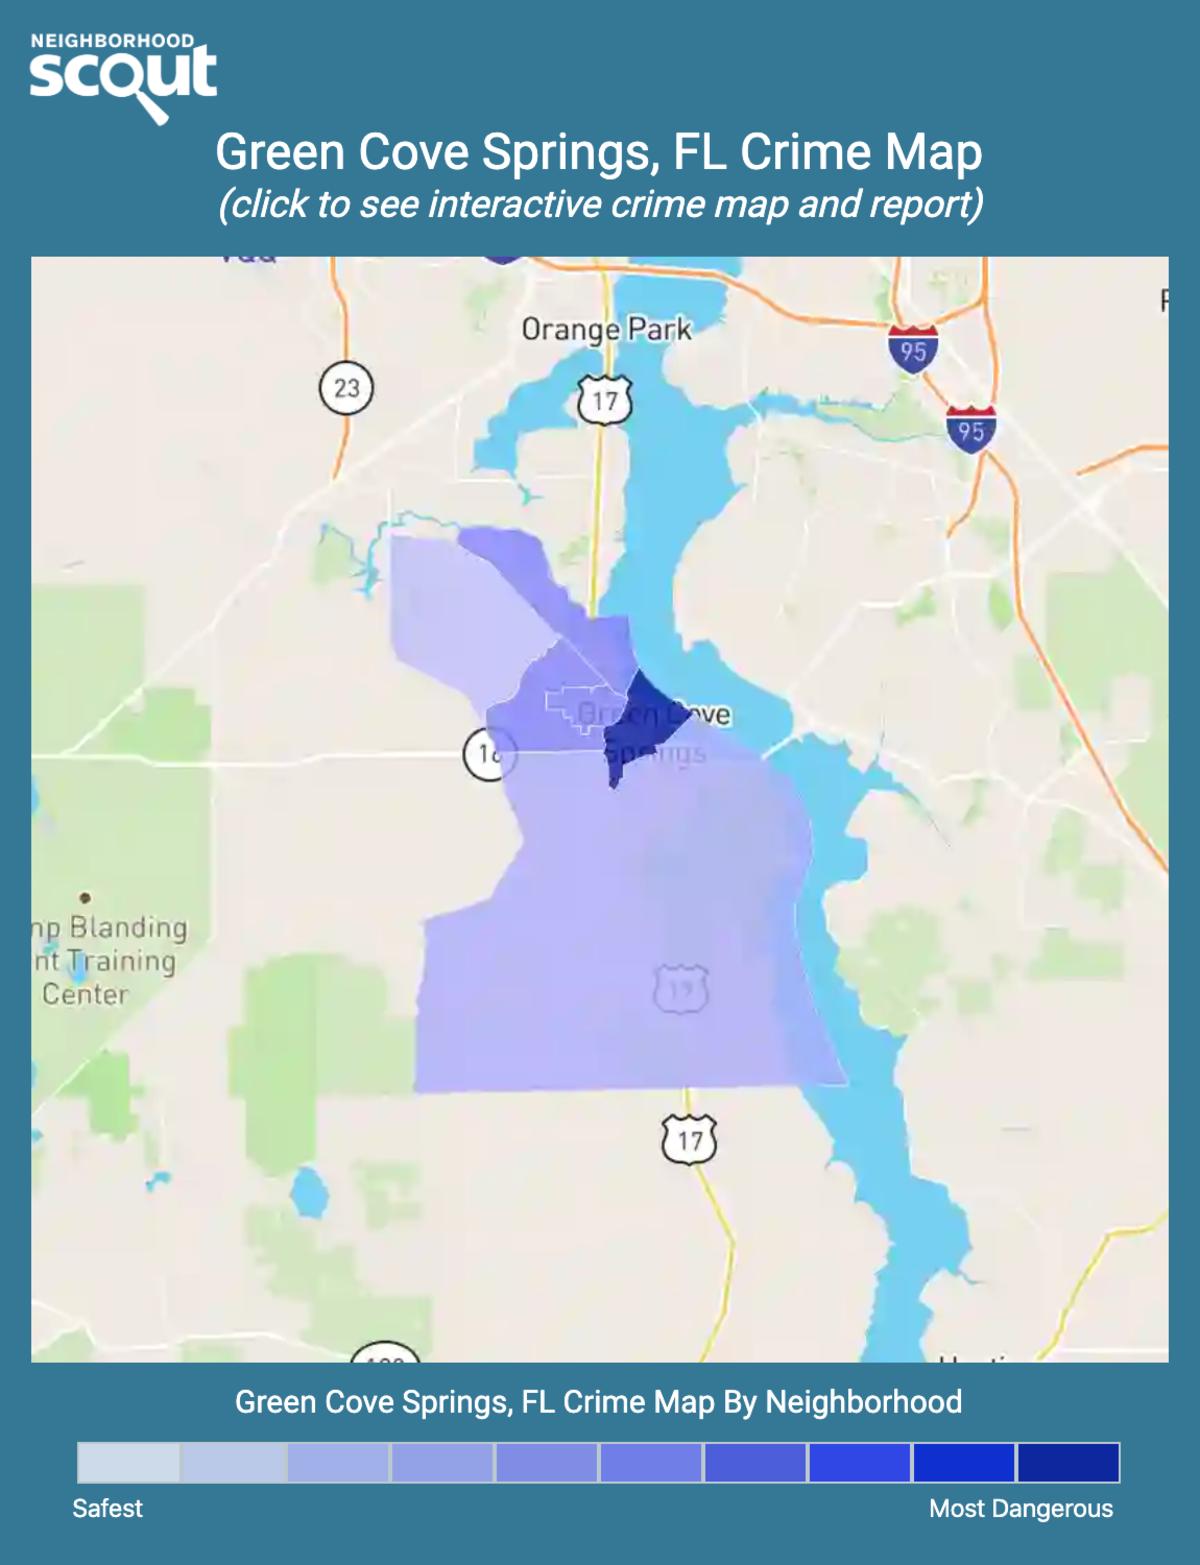 Green Cove Springs, Florida crime map